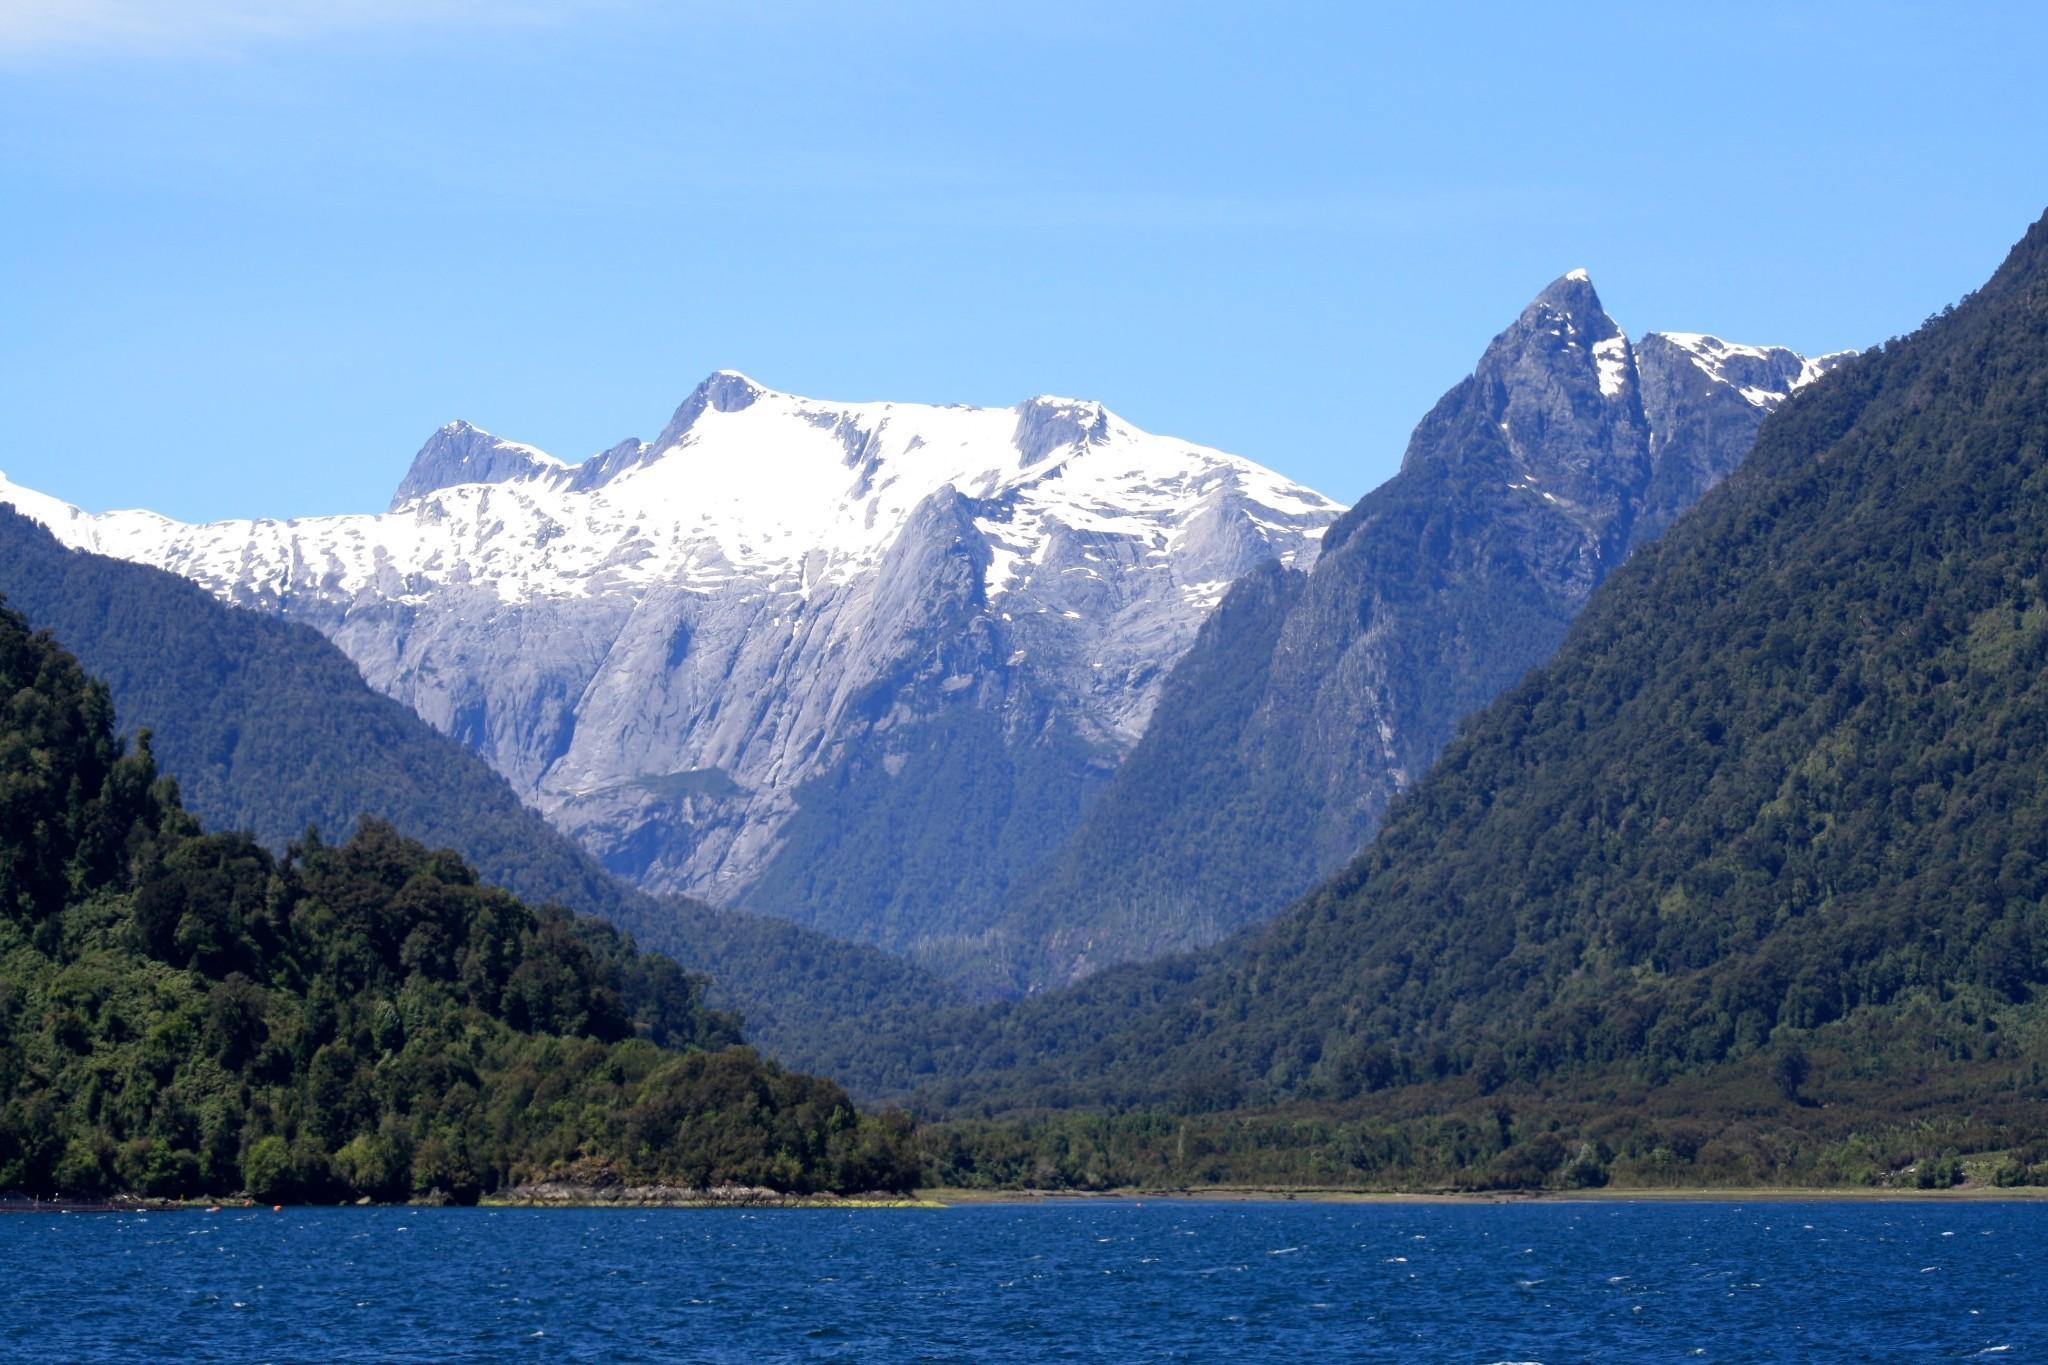 Sailing south: Patagonia by sea